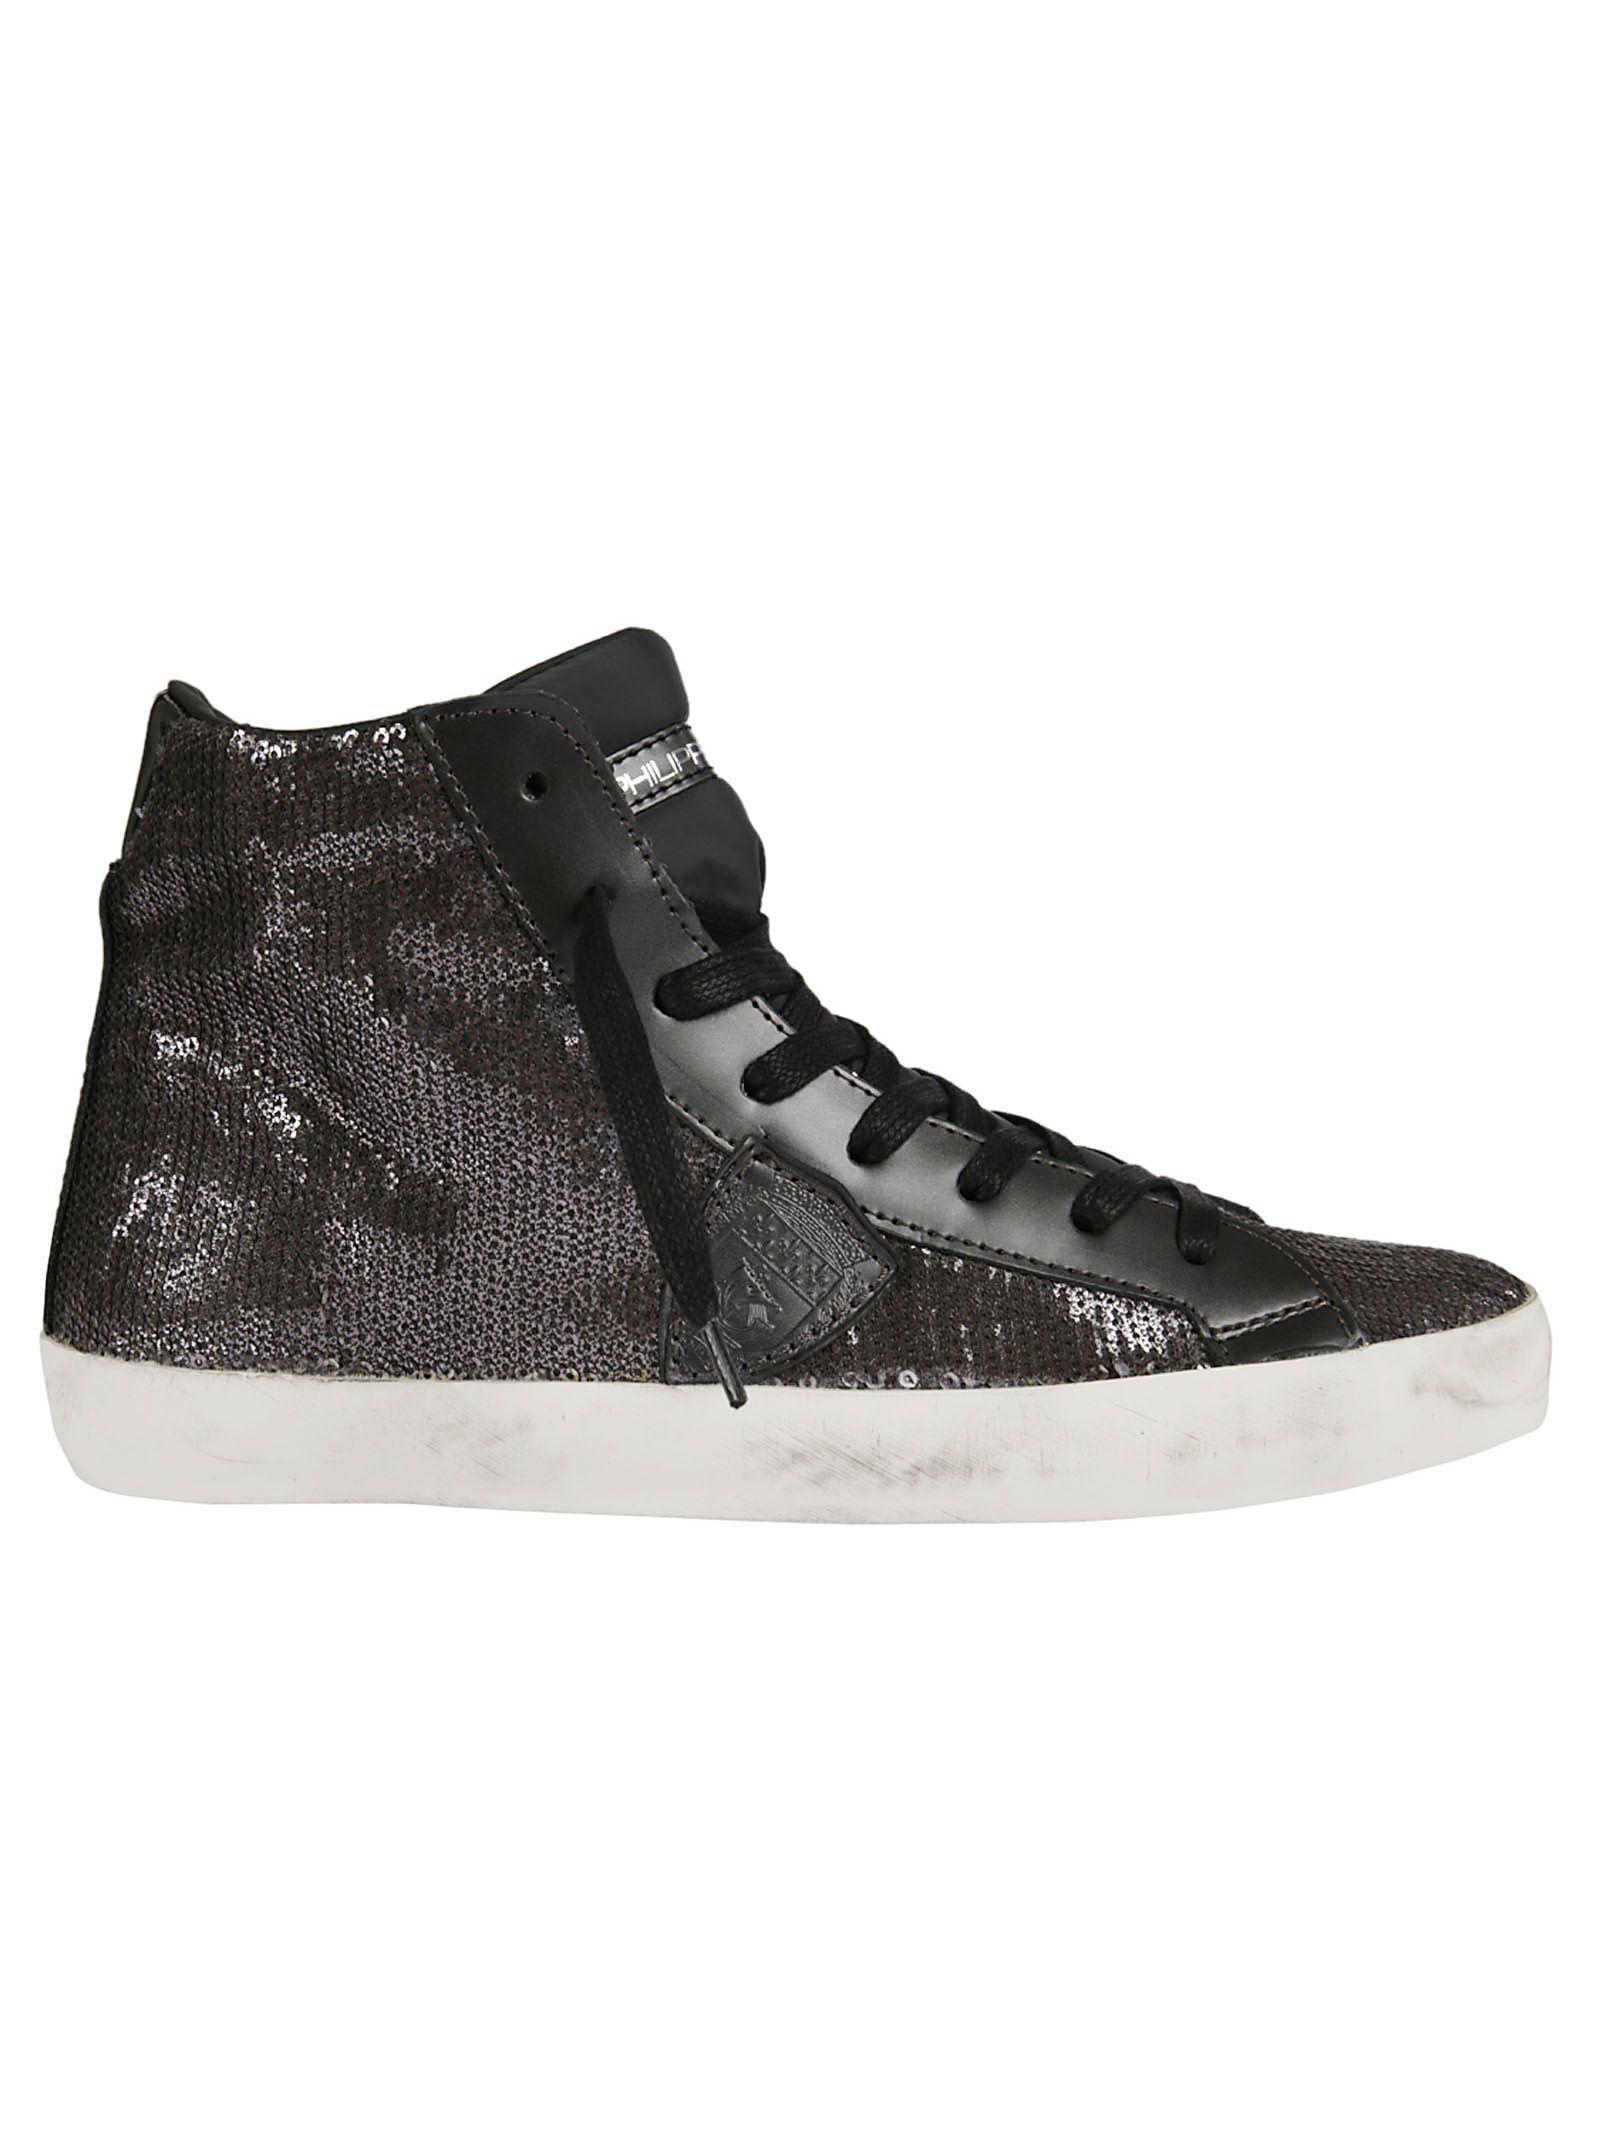 Philippe Model Embellished Sequins Hi-top Sneakers In Crisp